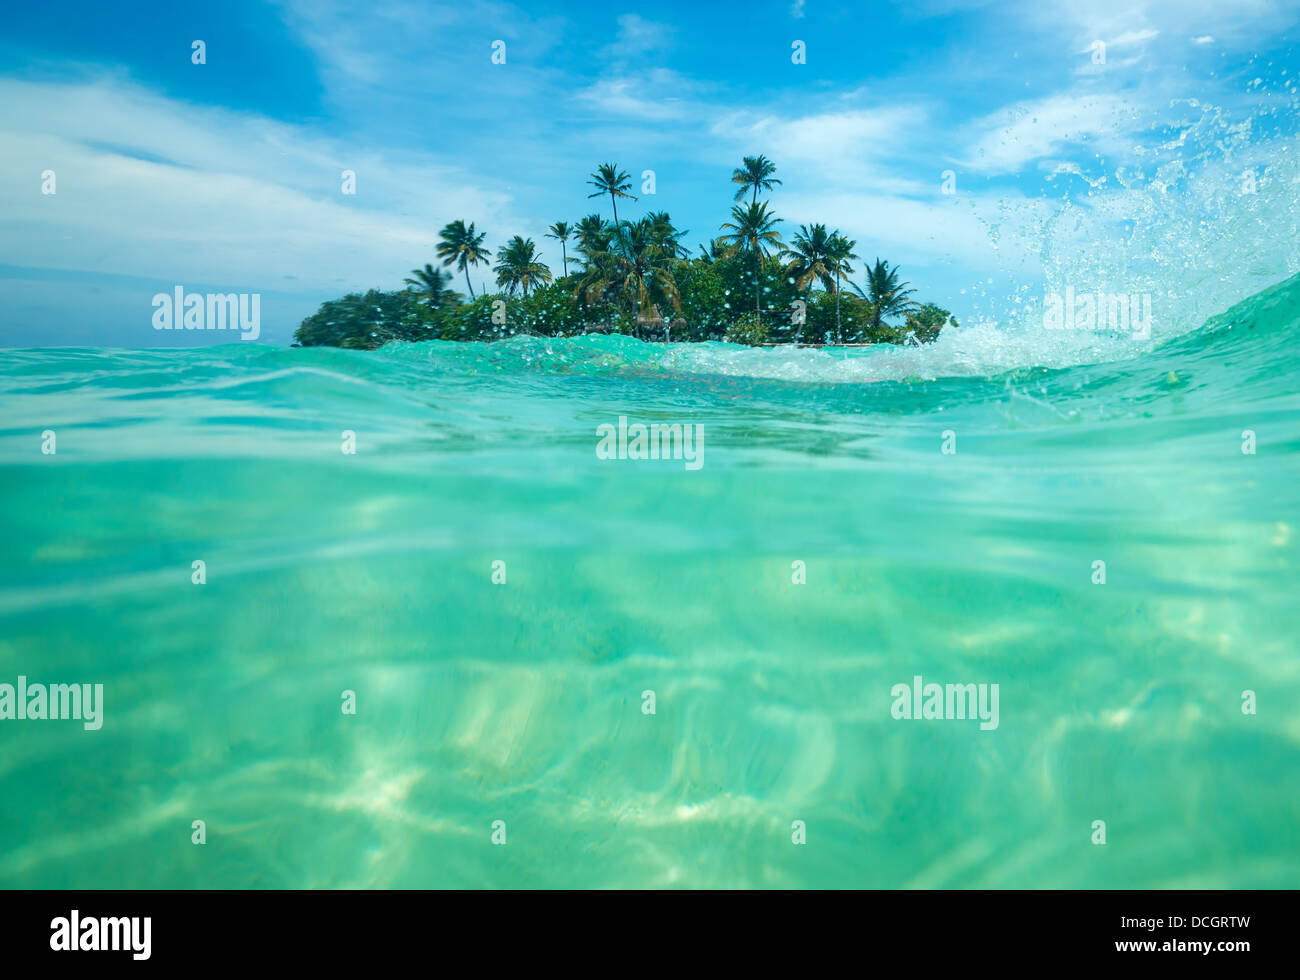 Tropische Insel im Ozean Stockbild